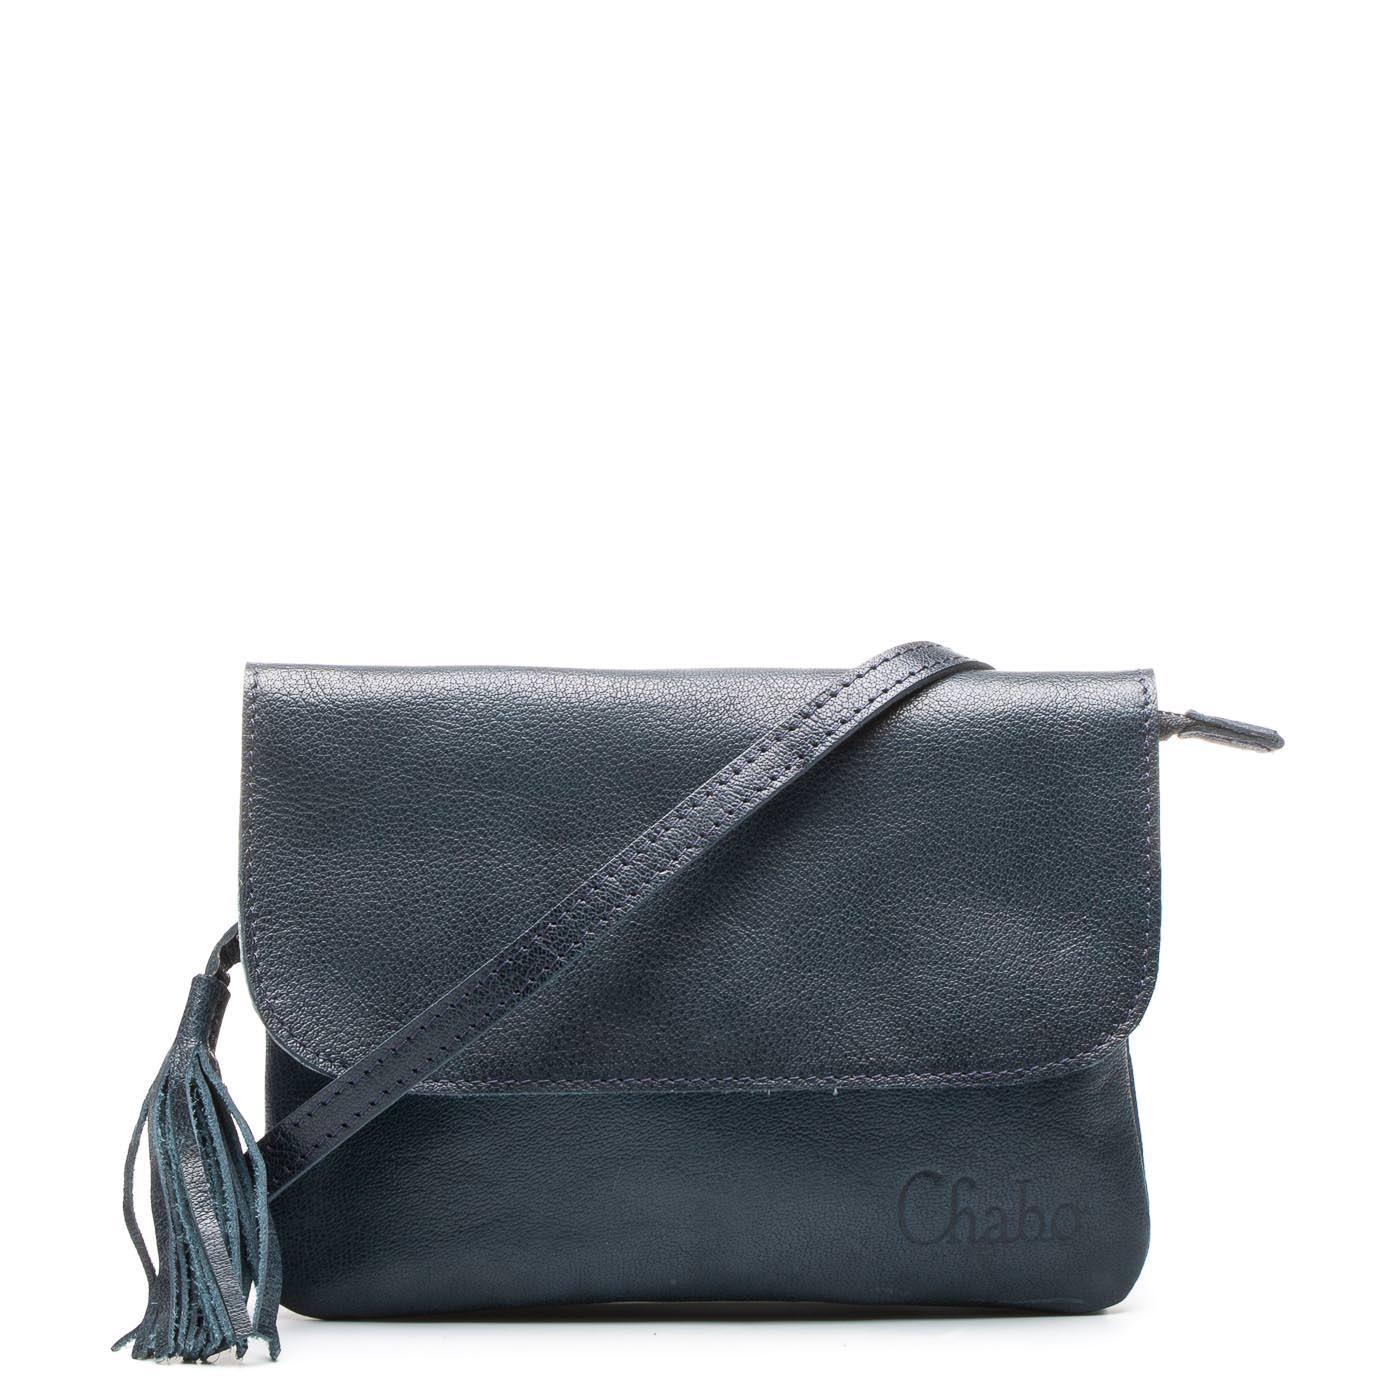 Chabo Bags Little Bink sac besace 8719274533924